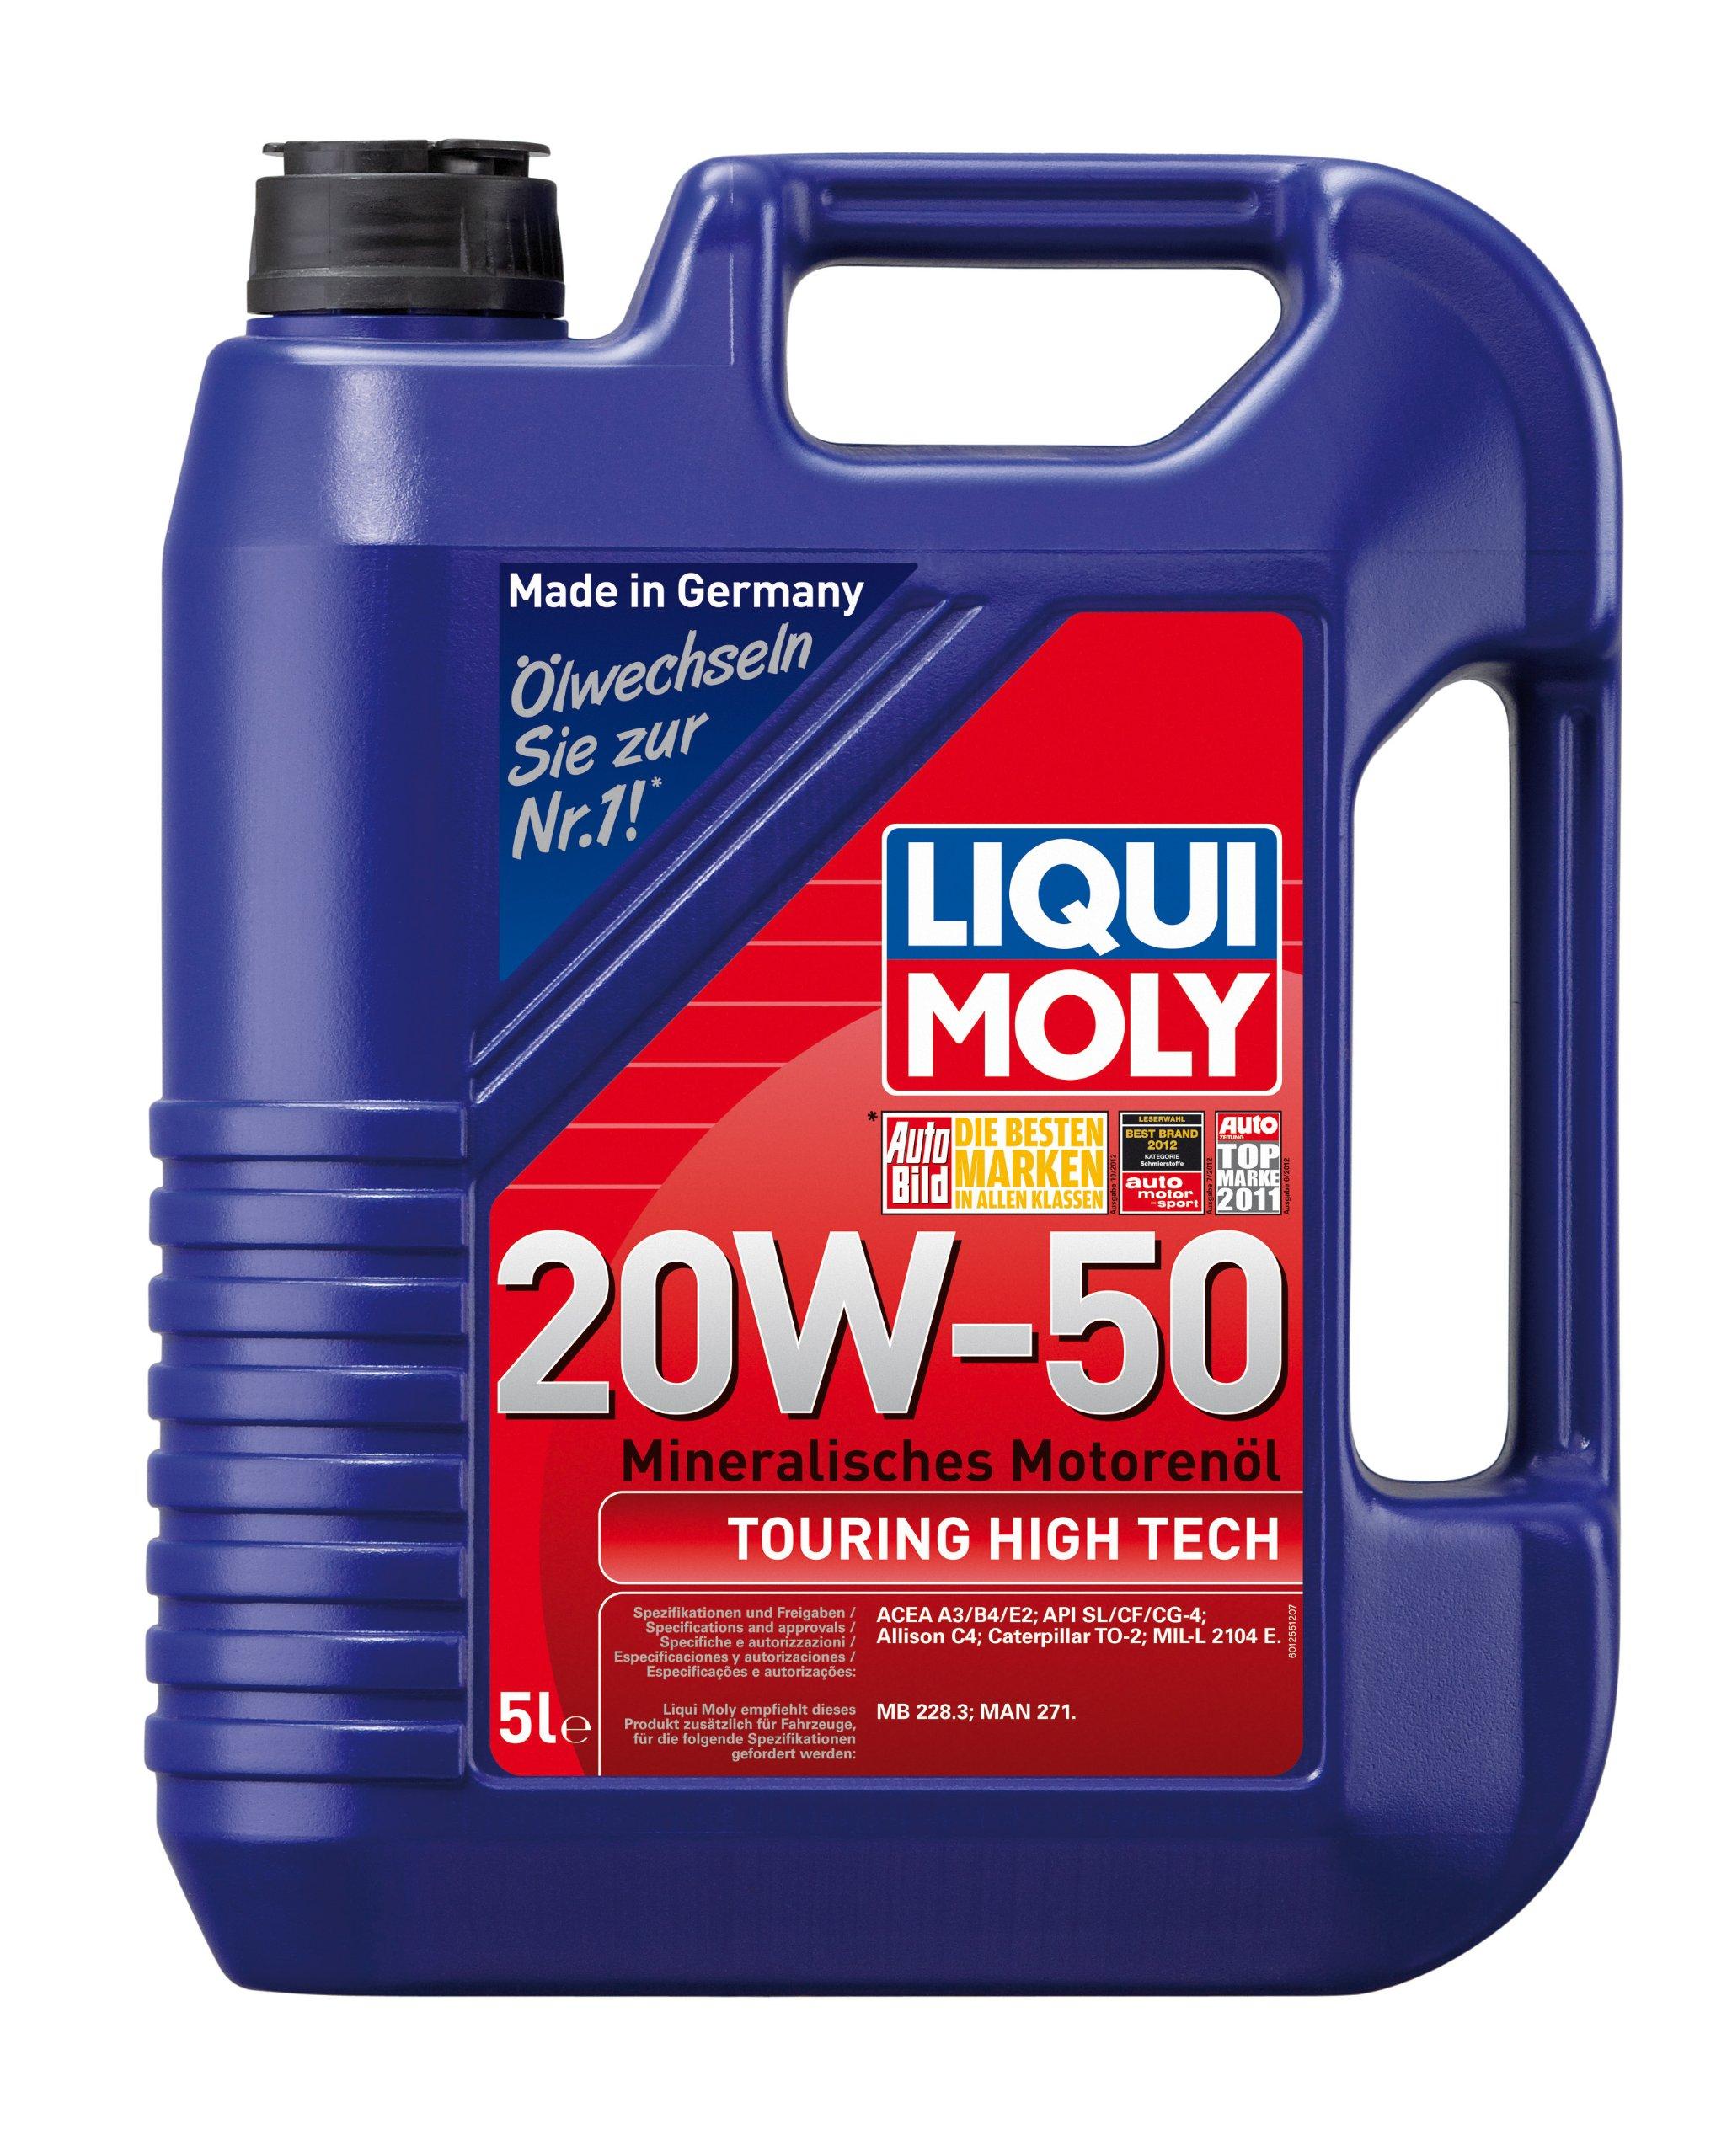 Liqui Moly Touring High Tech 1255 Engine Oil 20 W-50 5 Litres